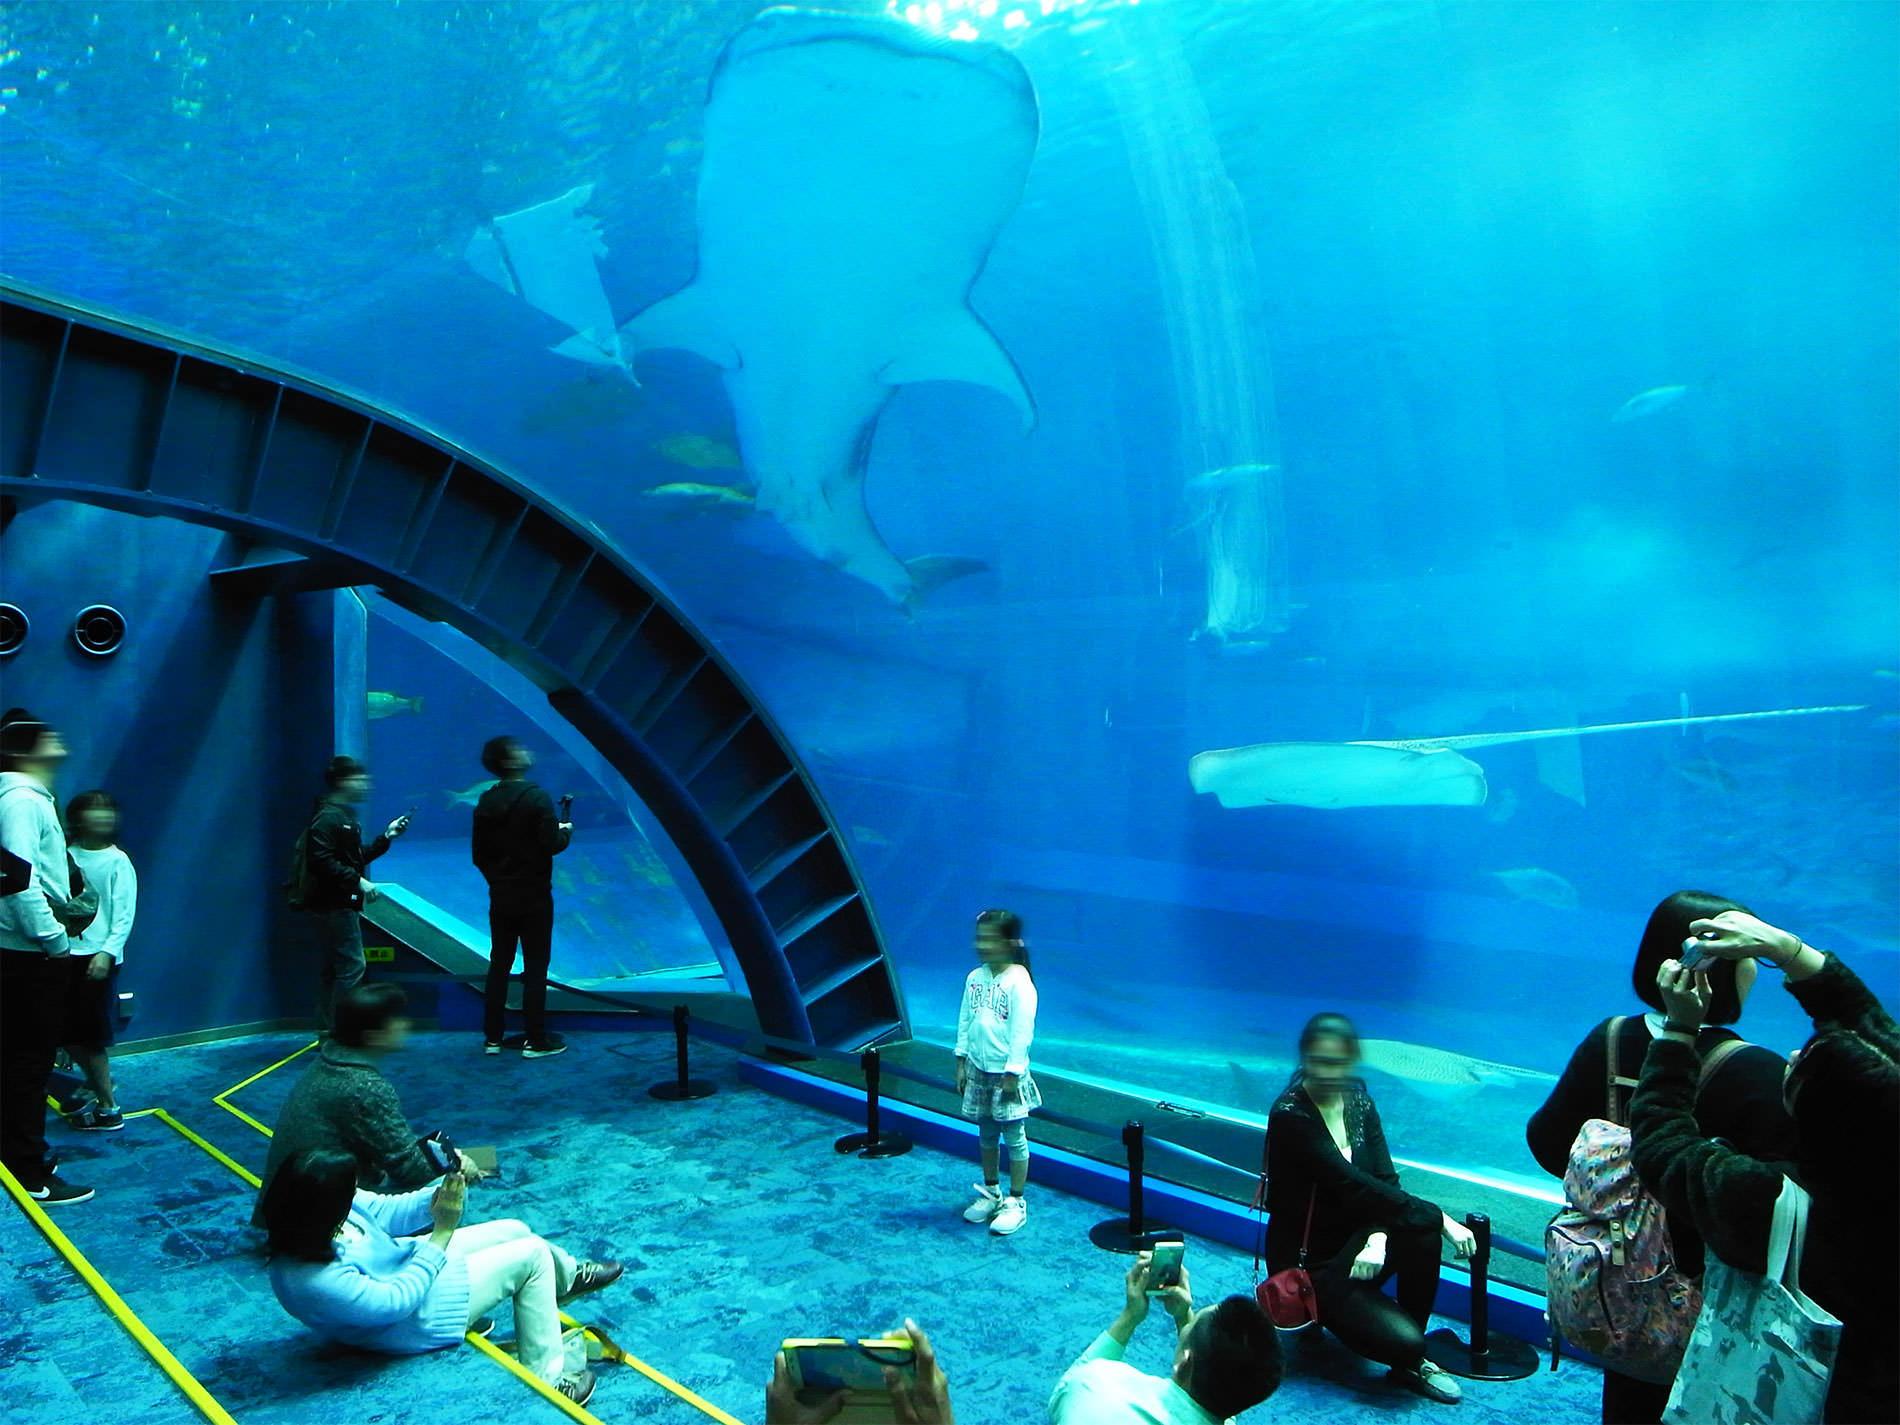 美ら海水族館 / 2018 / Okinawa trip to Okinawa Churaumi Aquarium